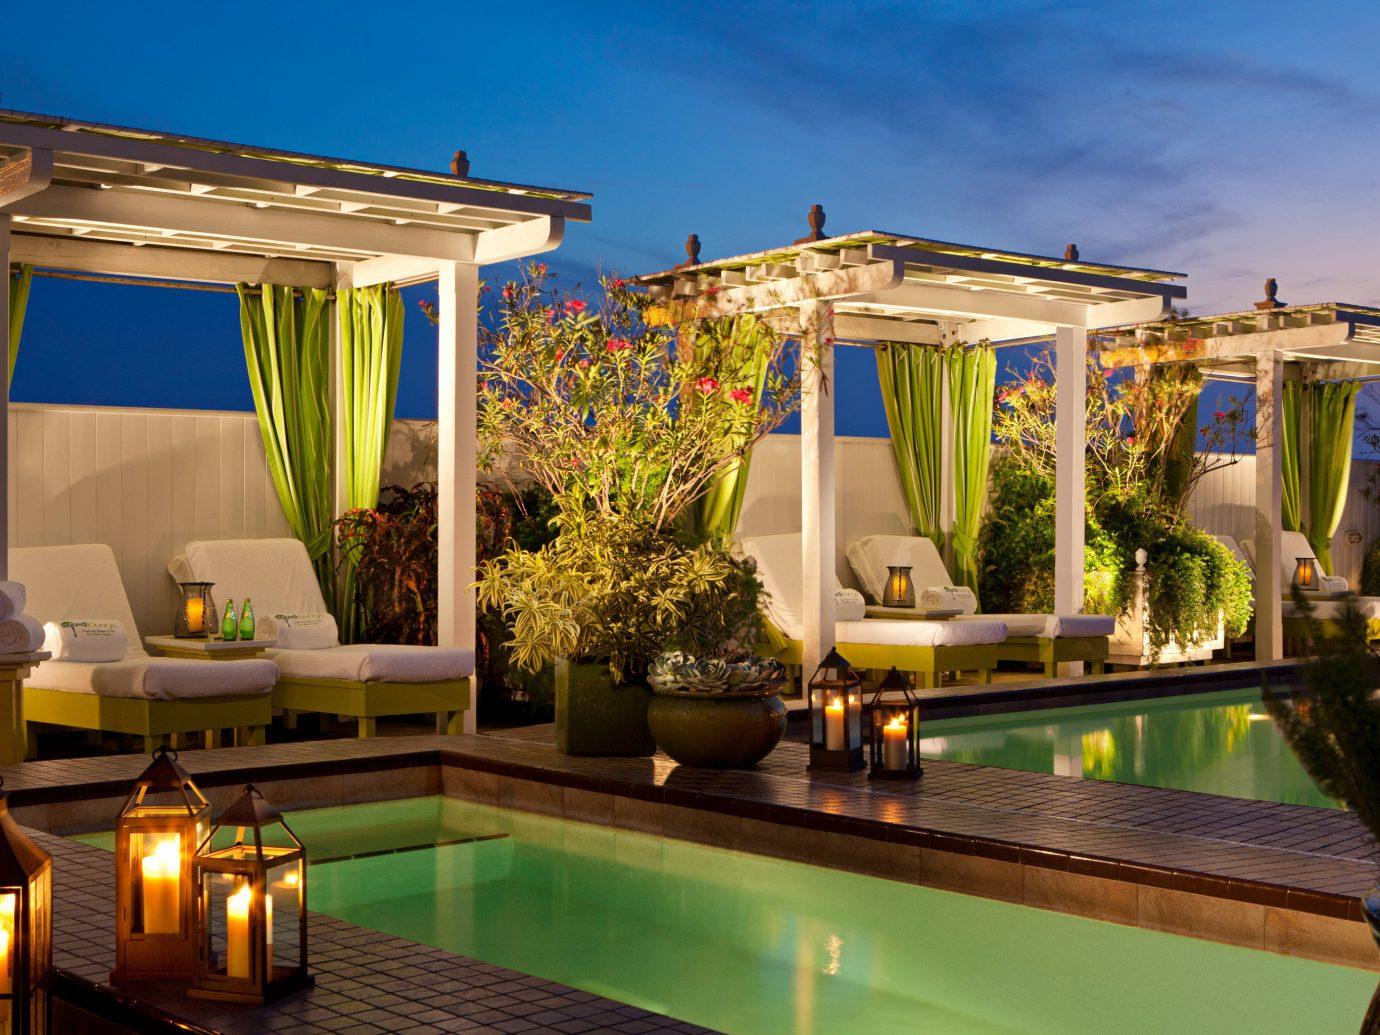 Elegant Florida Hotels Living Lounge Patio Pool Resort Terrace sky swimming pool property estate Villa home backyard interior design real estate mansion condominium outdoor structure